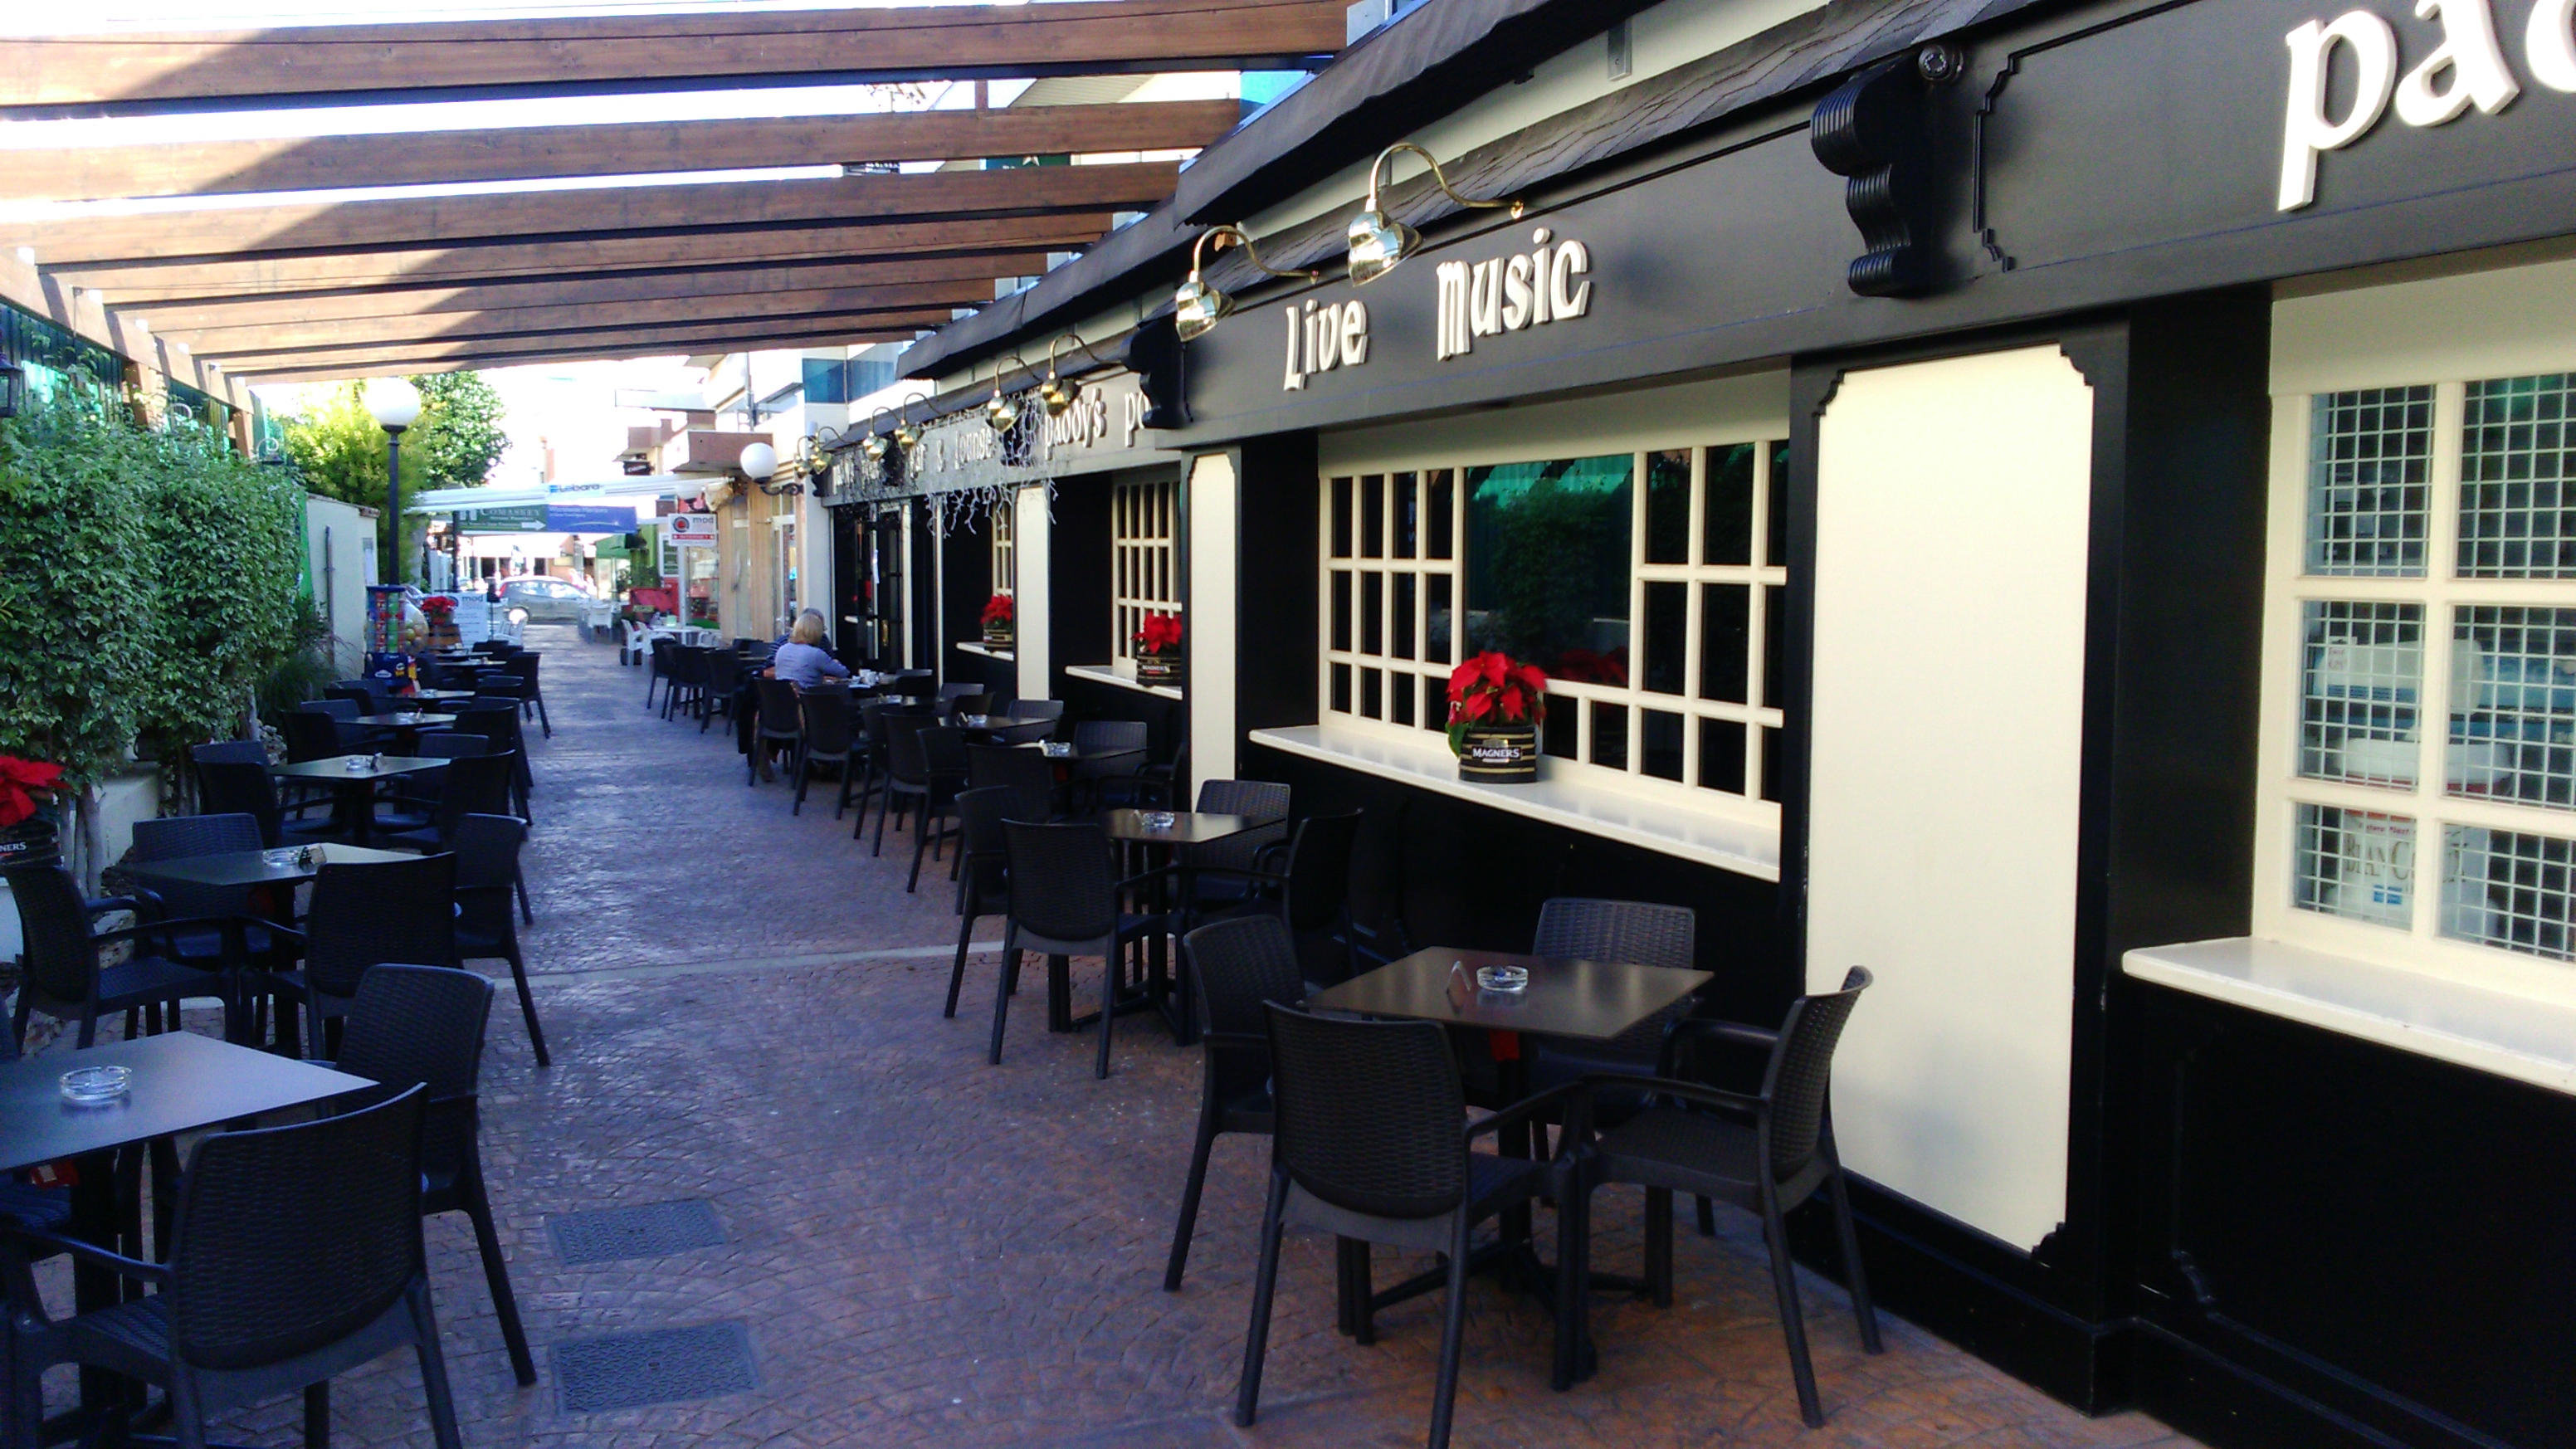 Historias de vacaciones en cabo roig caboroigblog for Como crear un restaurante